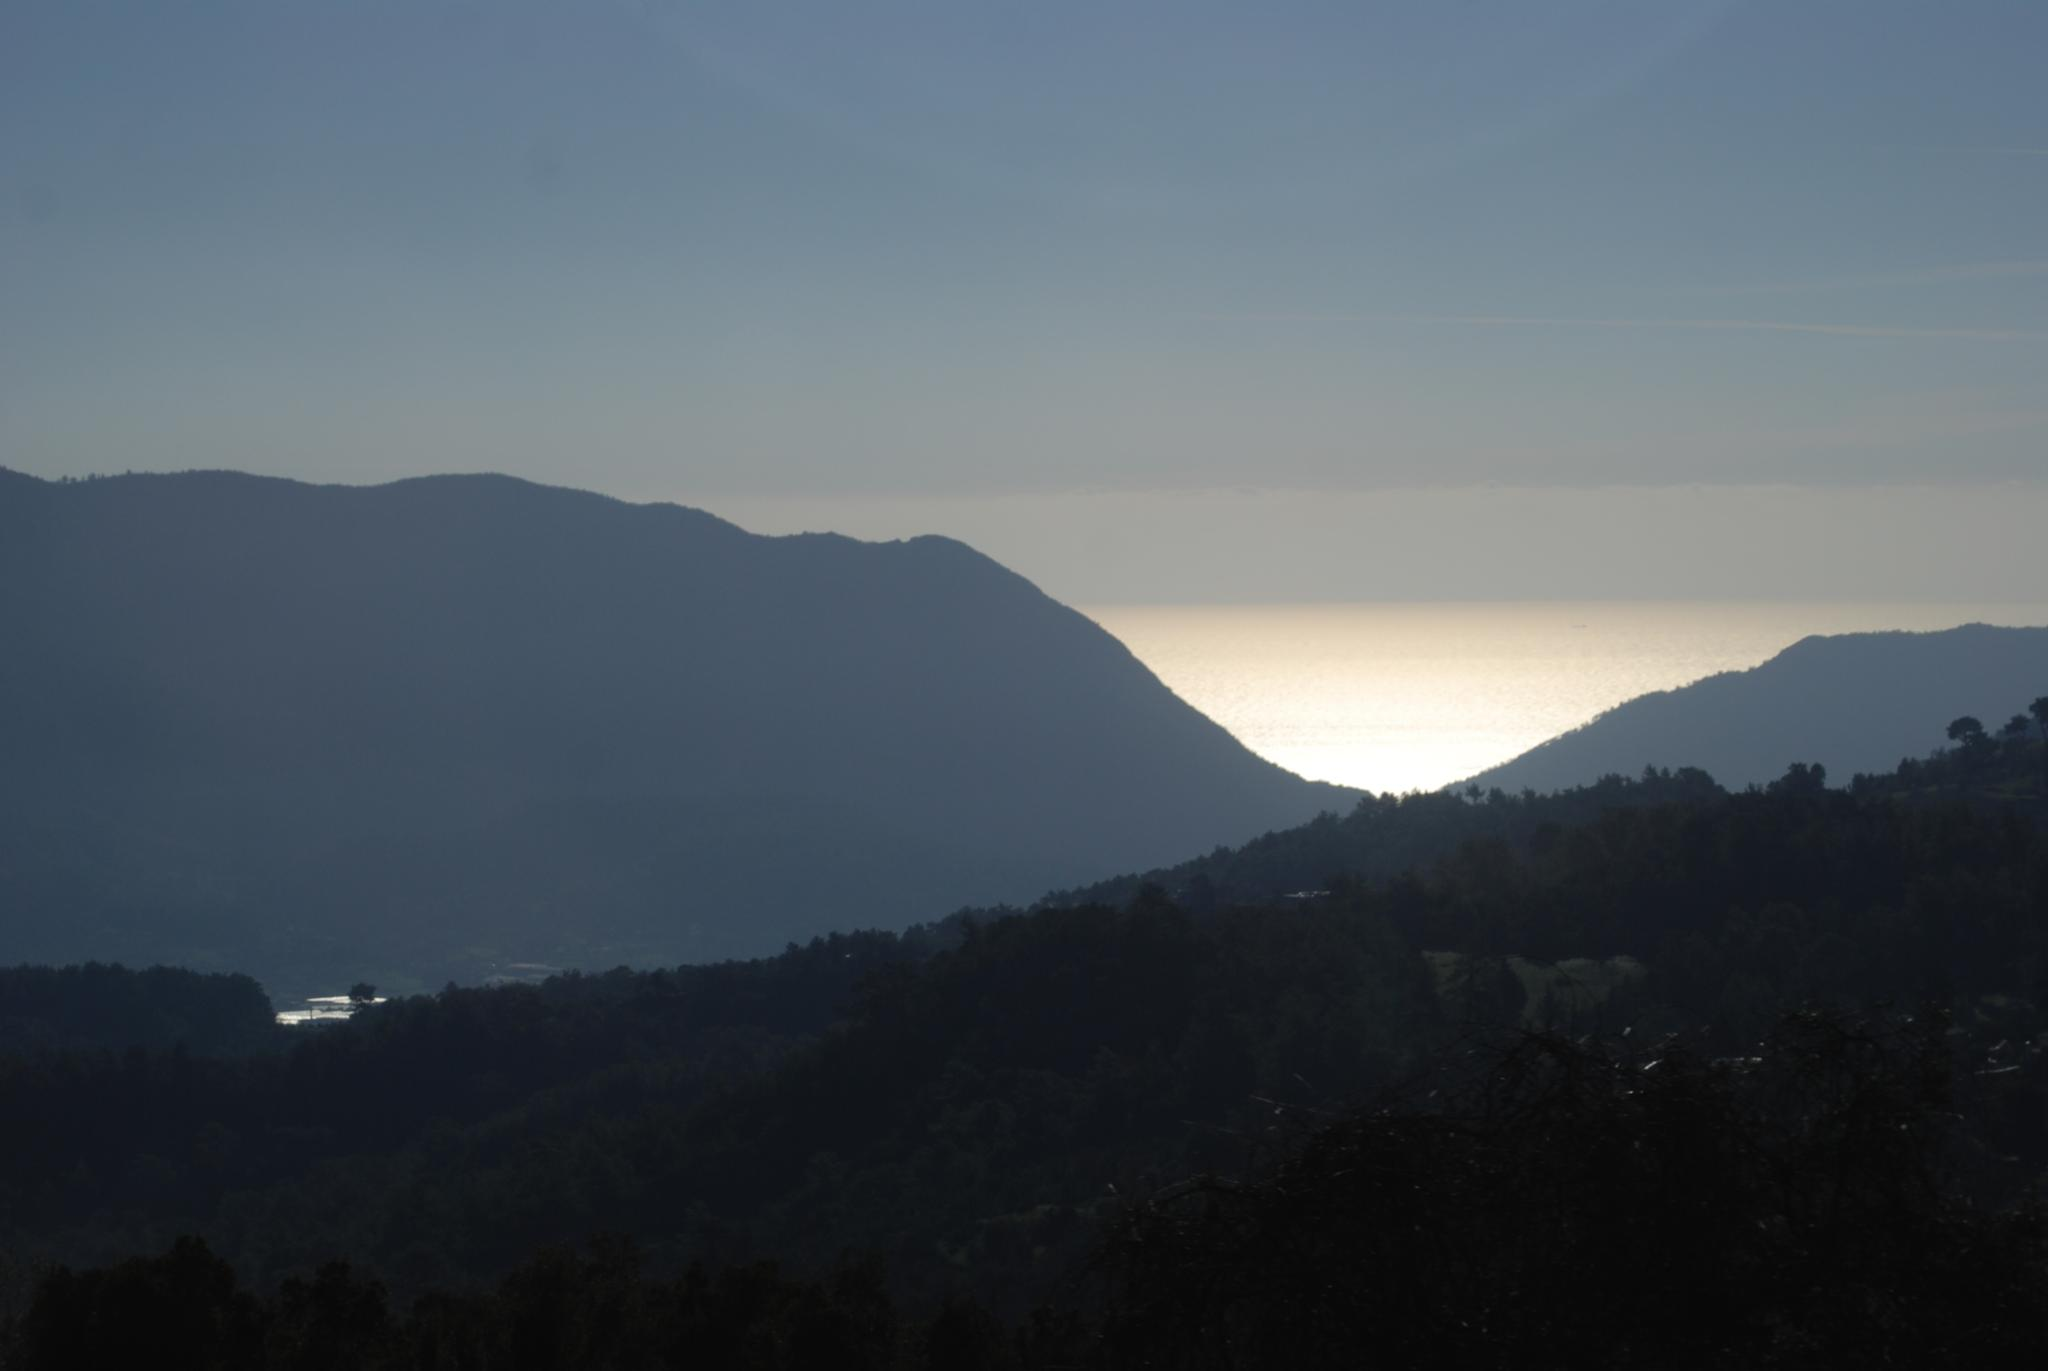 Landscape by hoffcecilia